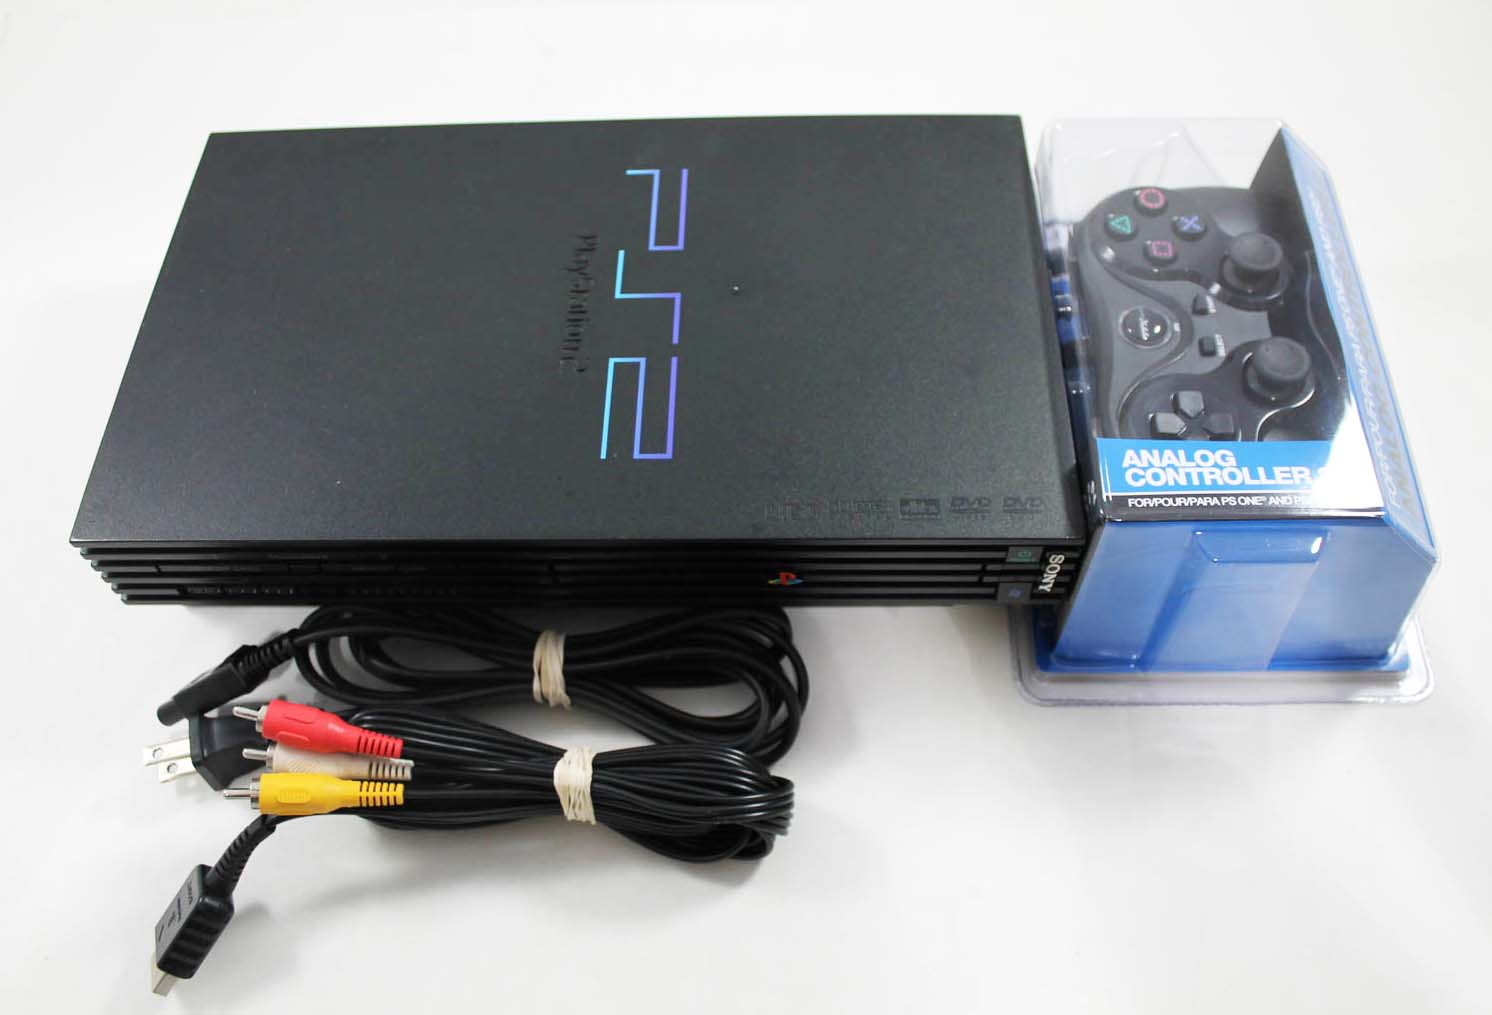 Se reveló cuál iba a ser el verdadero nombre de la PlayStation 2